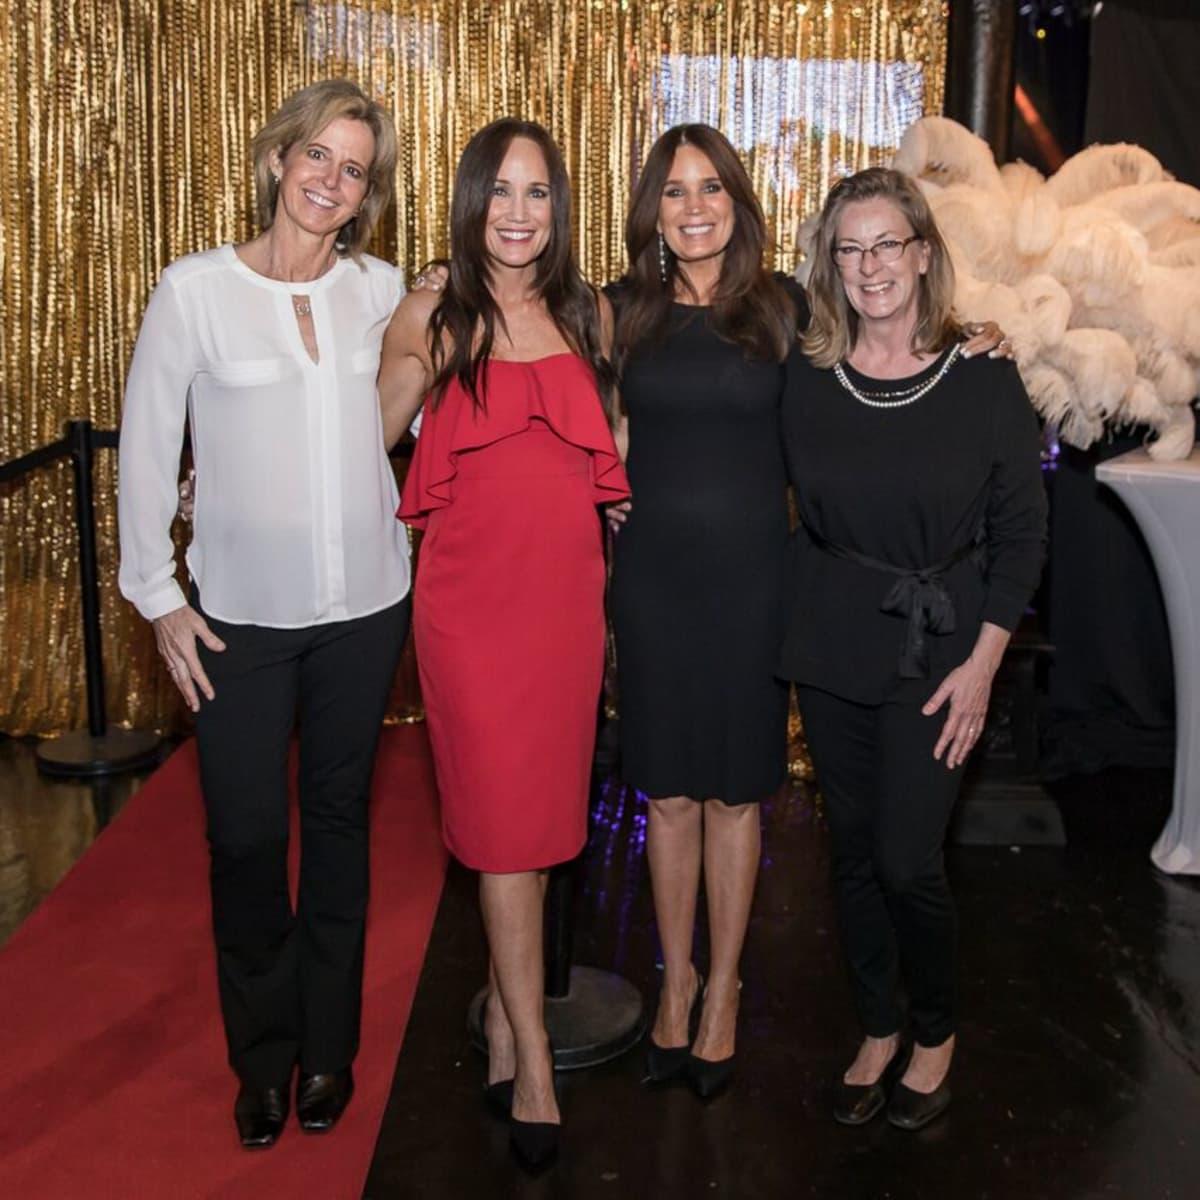 Equest After Dark Gala 2018, Stephany Younge, Michelle King, Debi Hensley, Jude Kazmaier